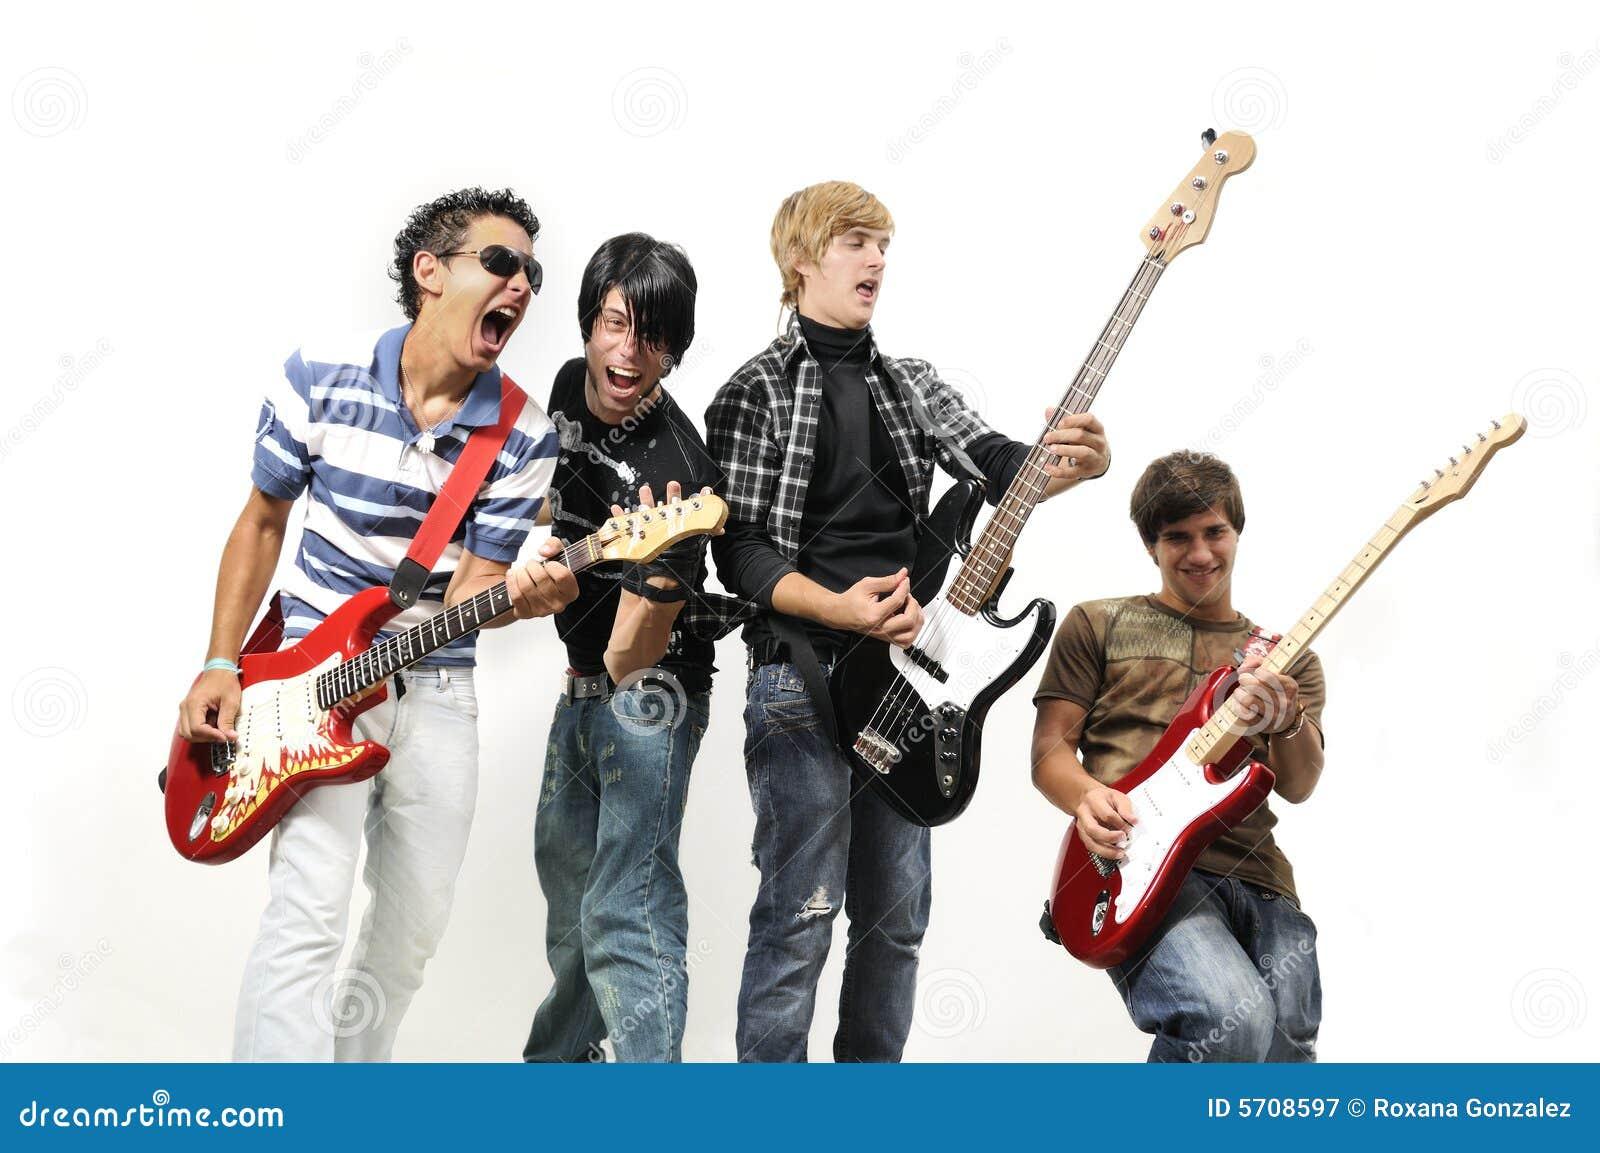 Banda rock teenager